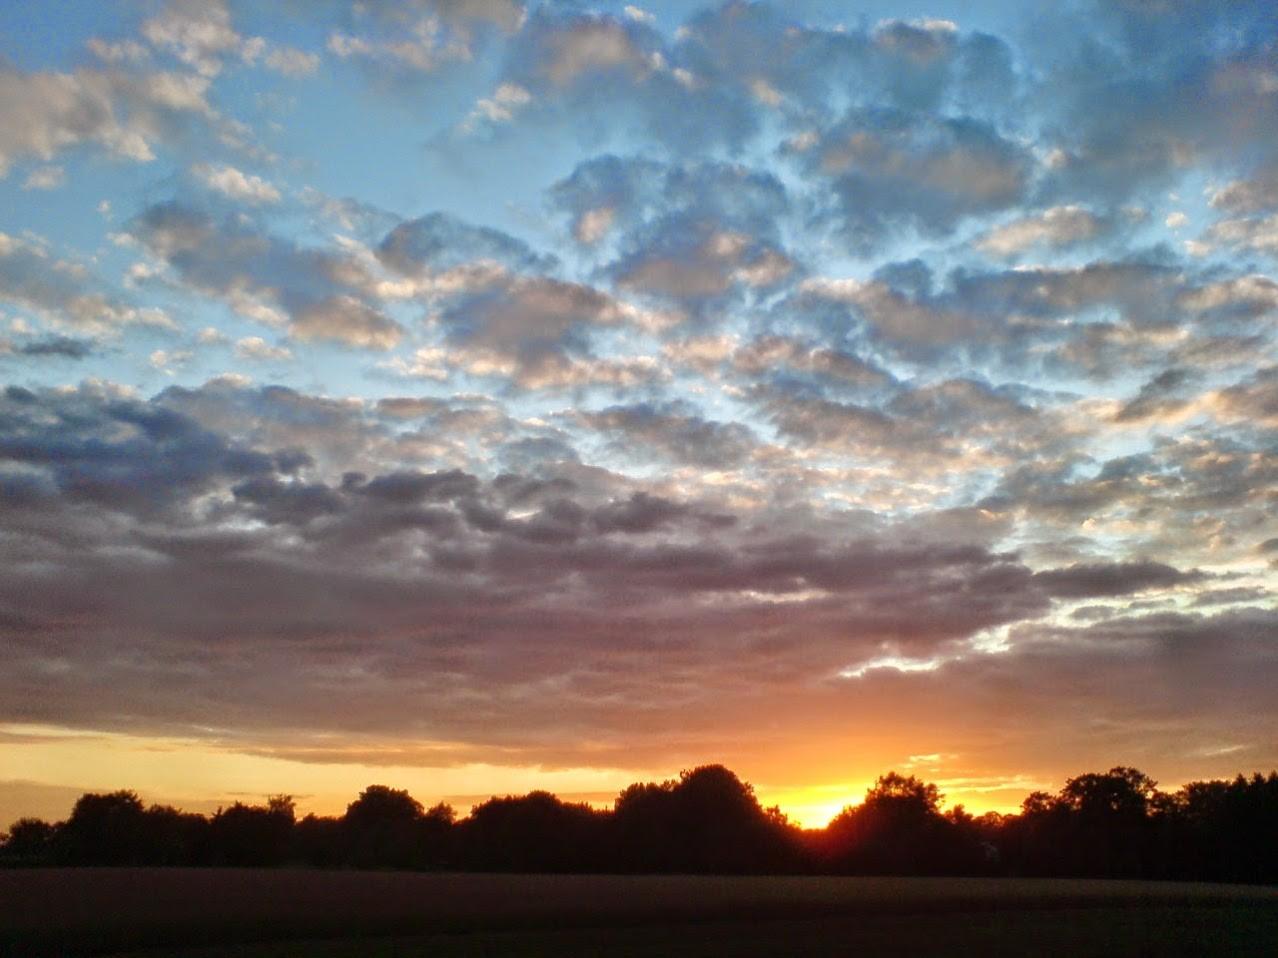 ~ Bild: Sonnenuntergang ~